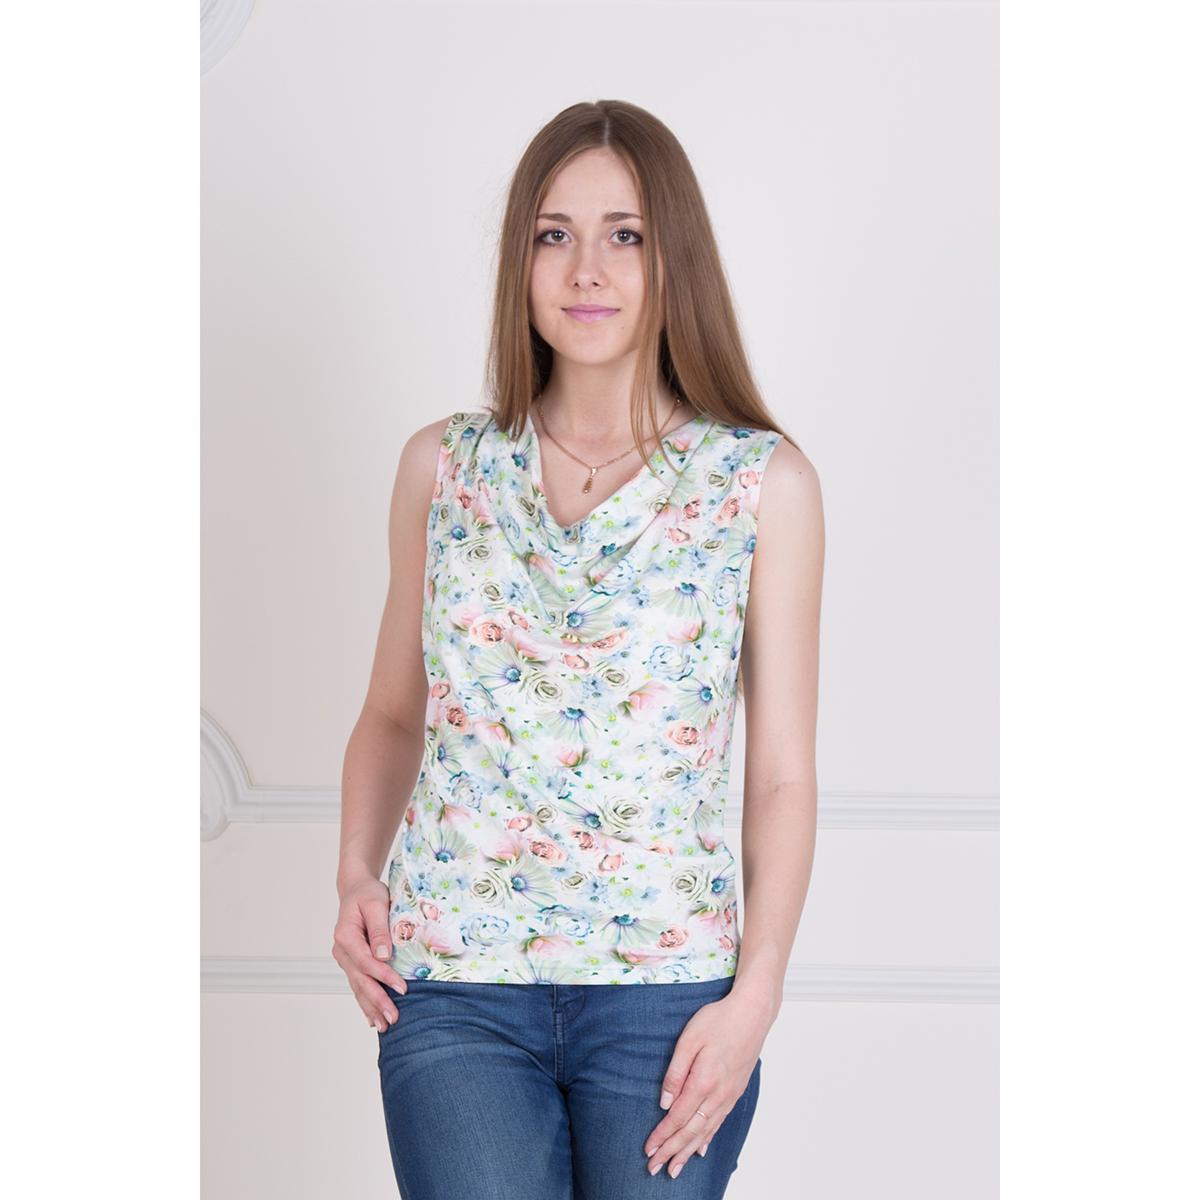 Женская блуза Элиза арт. 0116, размер 44Блузки, майки, кофты<br>Обхват груди:88 см<br>Обхват талии:68 см<br>Обхват бедер:96 см<br>Рост:167 см<br><br>Тип: Жен. блуза<br>Размер: 44<br>Материал: Вискоза